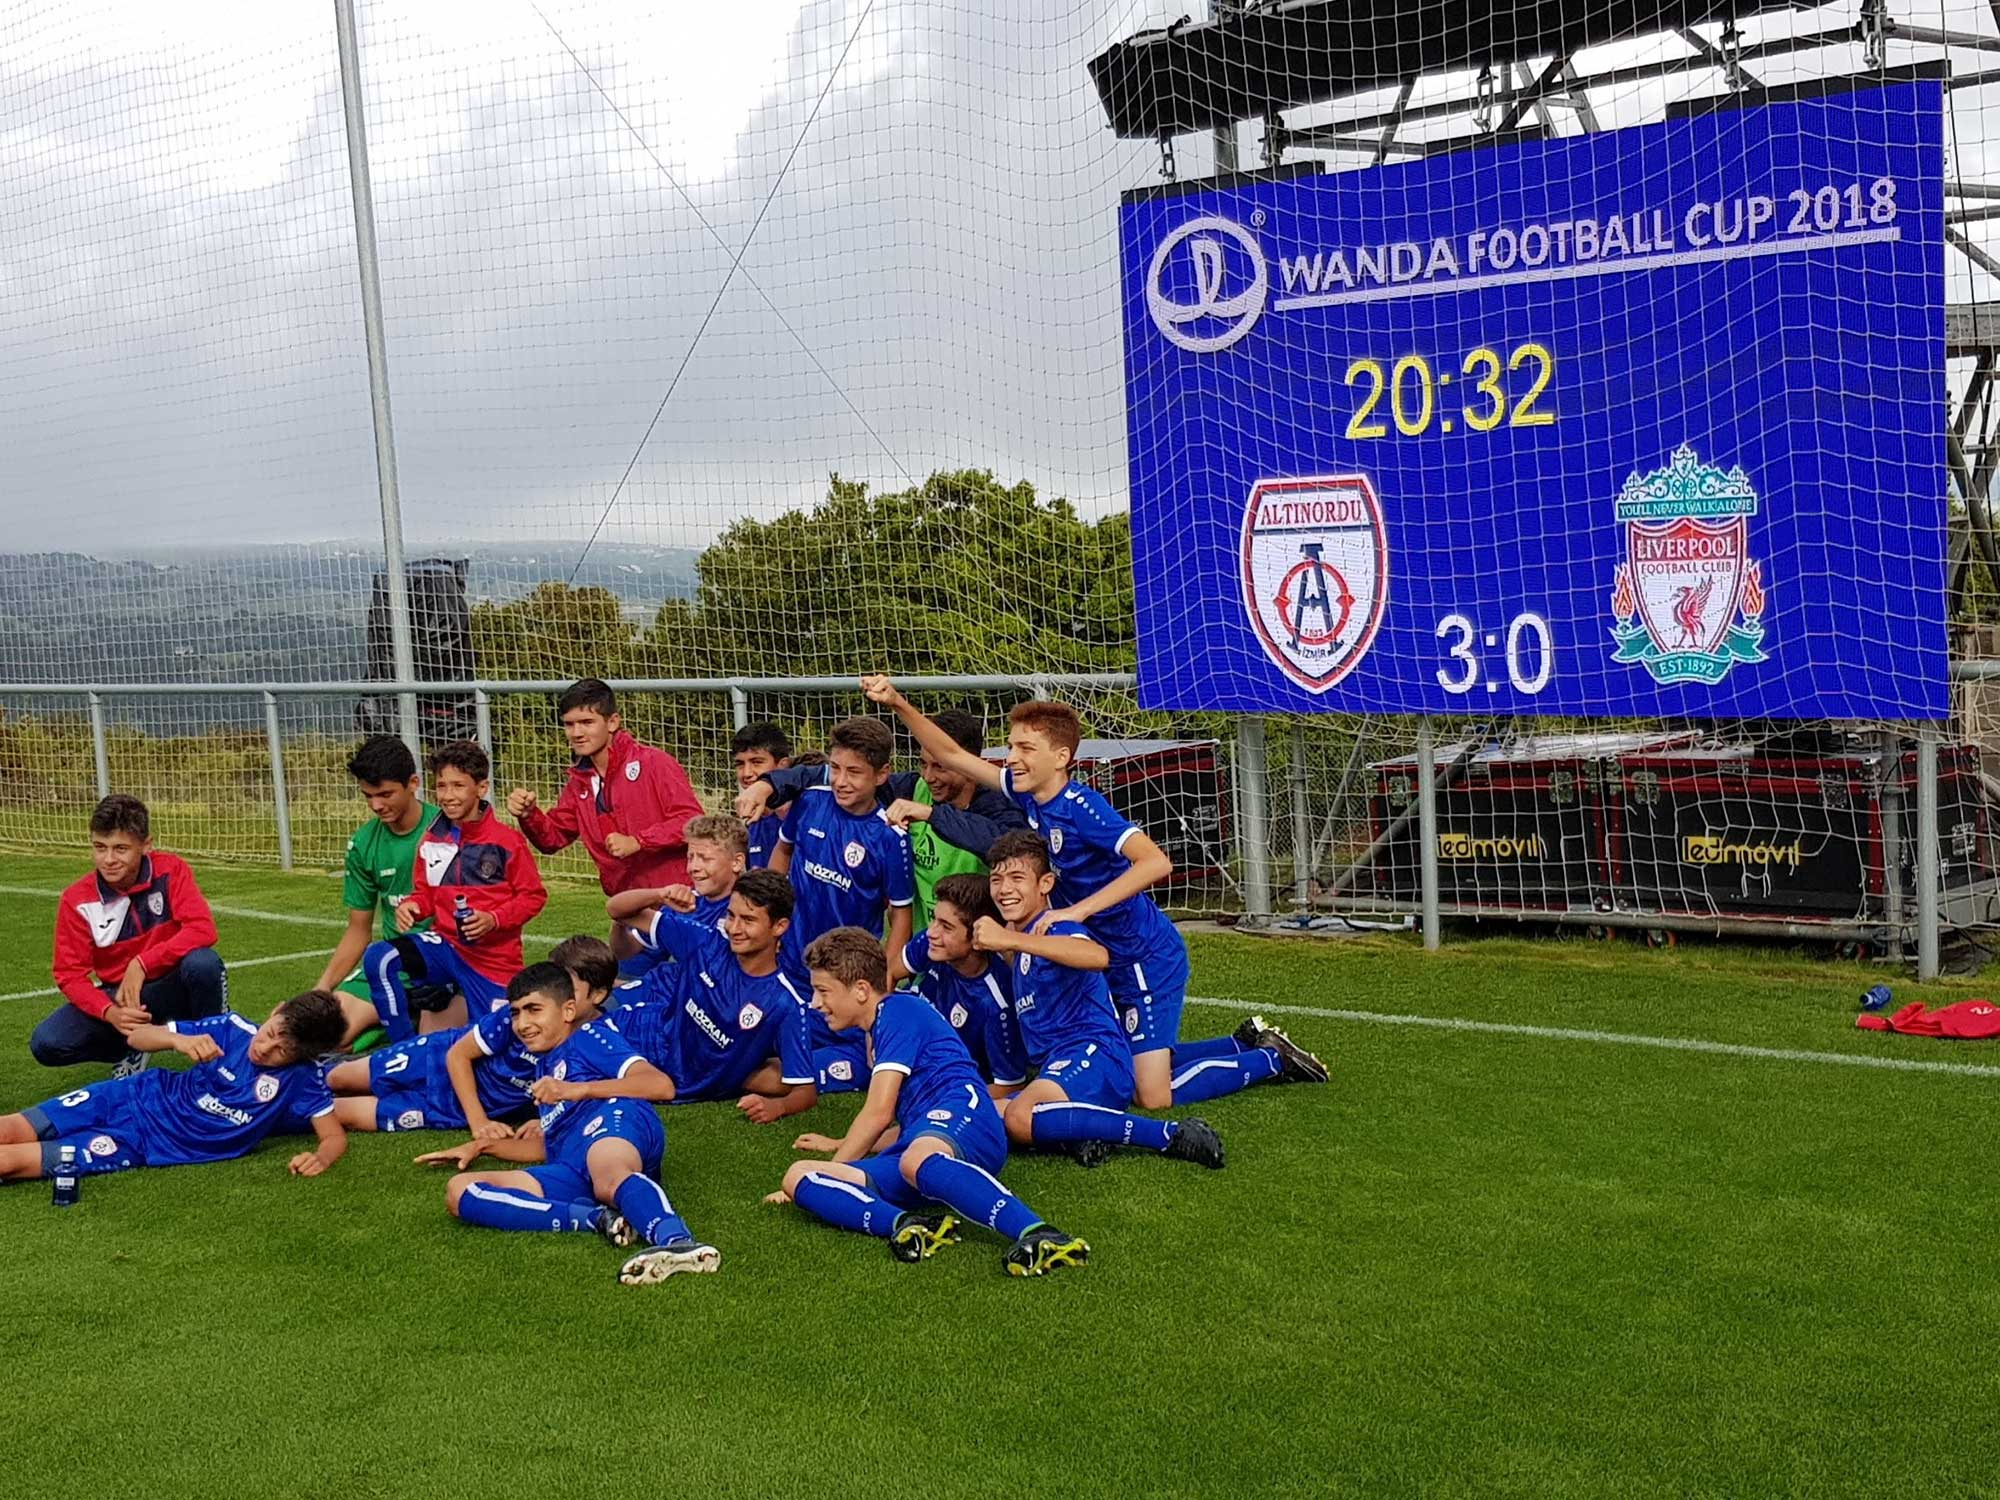 Torneo Wanda Football Cup